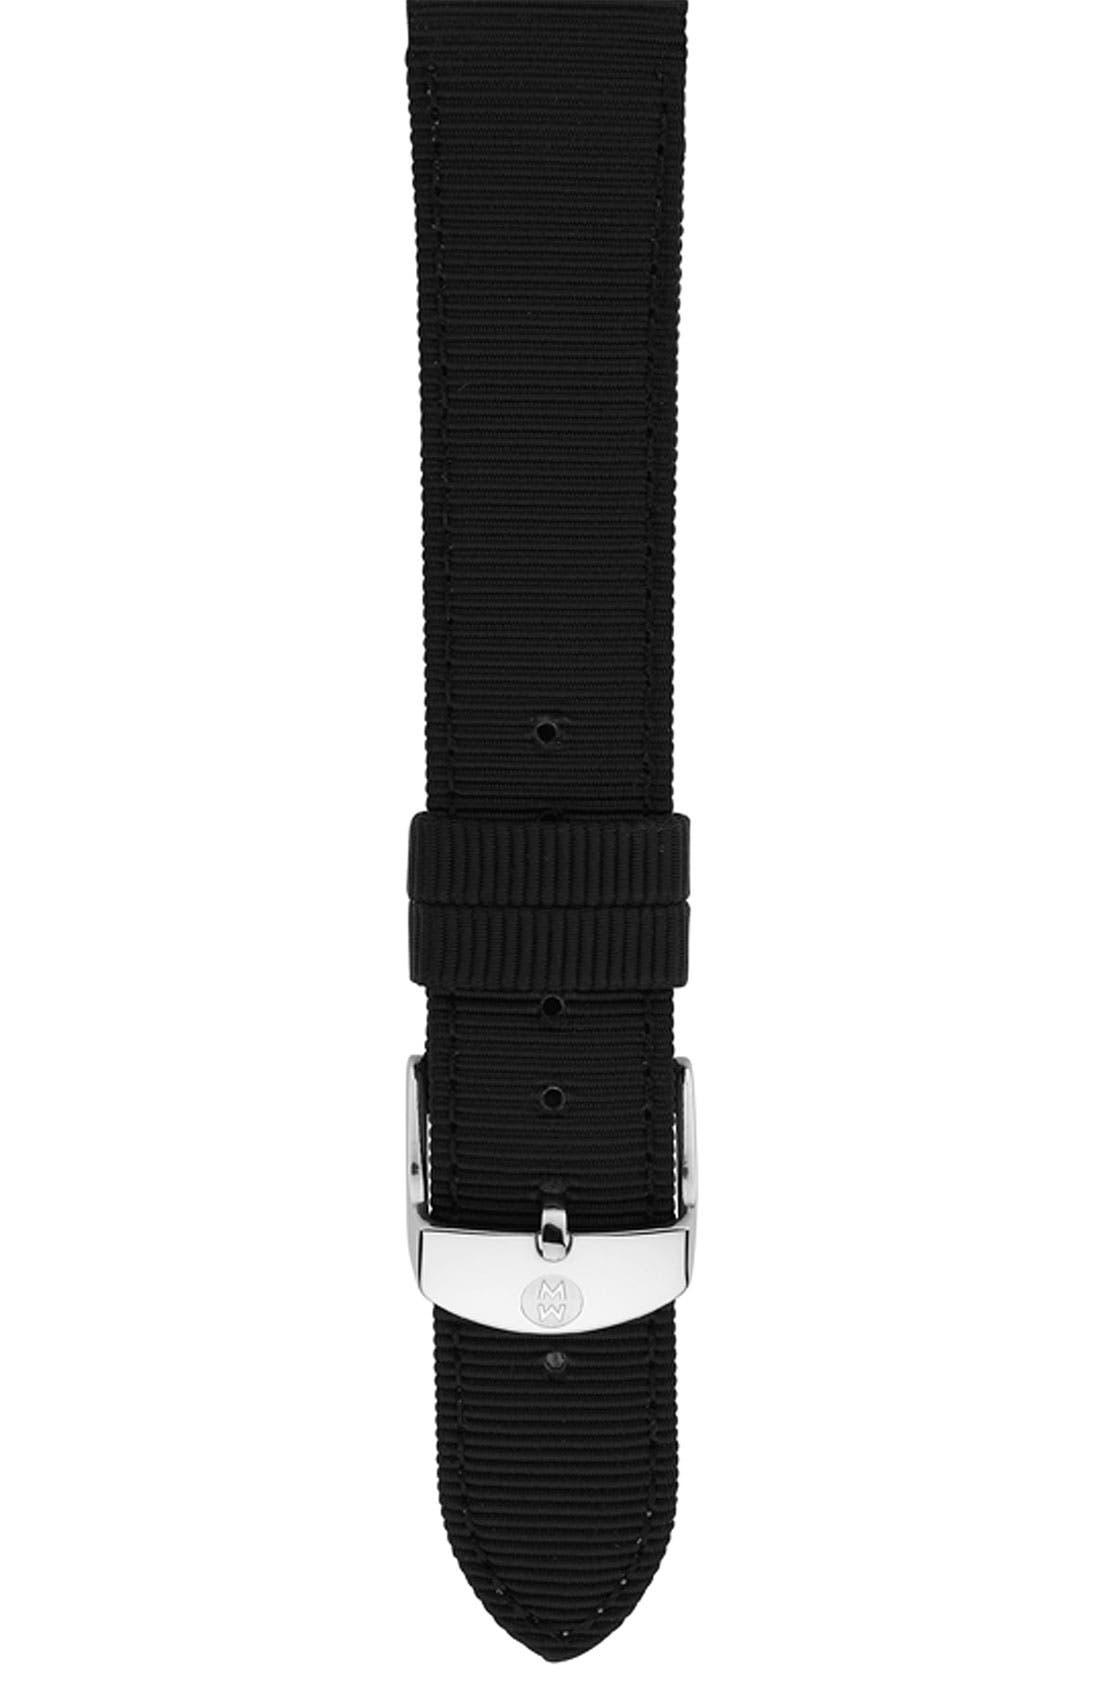 Main Image - MICHELE 16mm Grosgrain Watch Strap